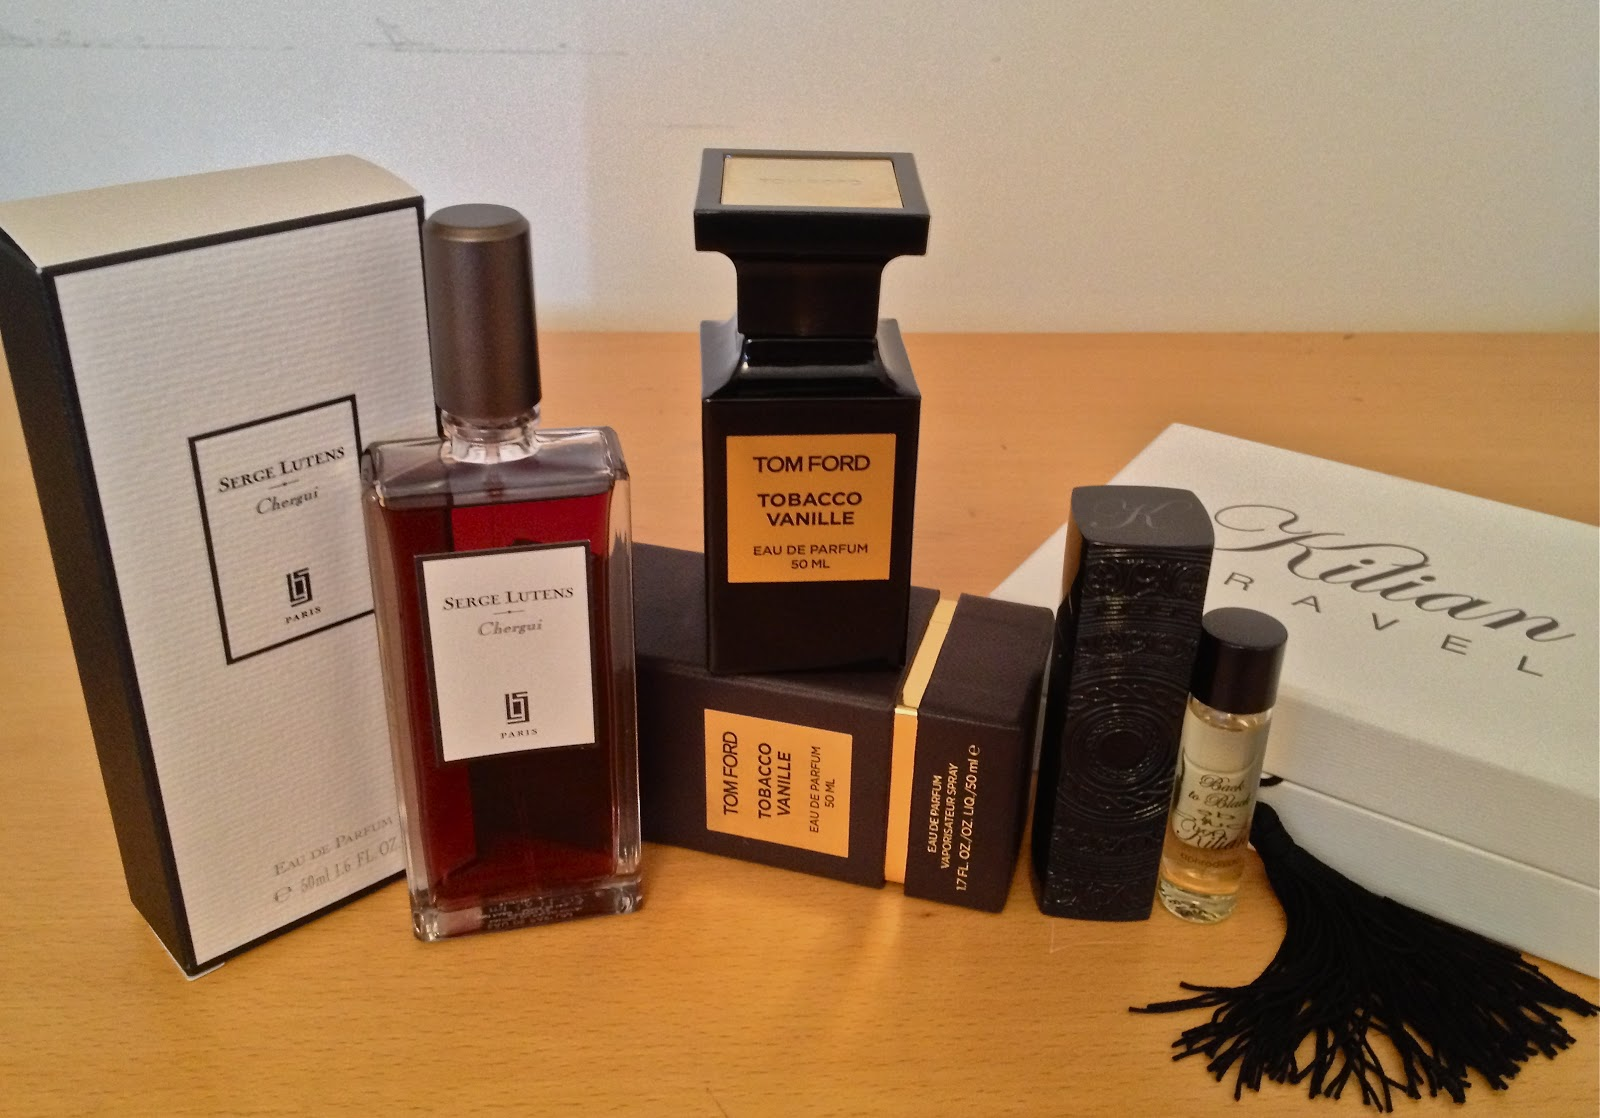 My Perfume Diaries: Back To Black Vs Chergui Vs Tobacco Vanille ...